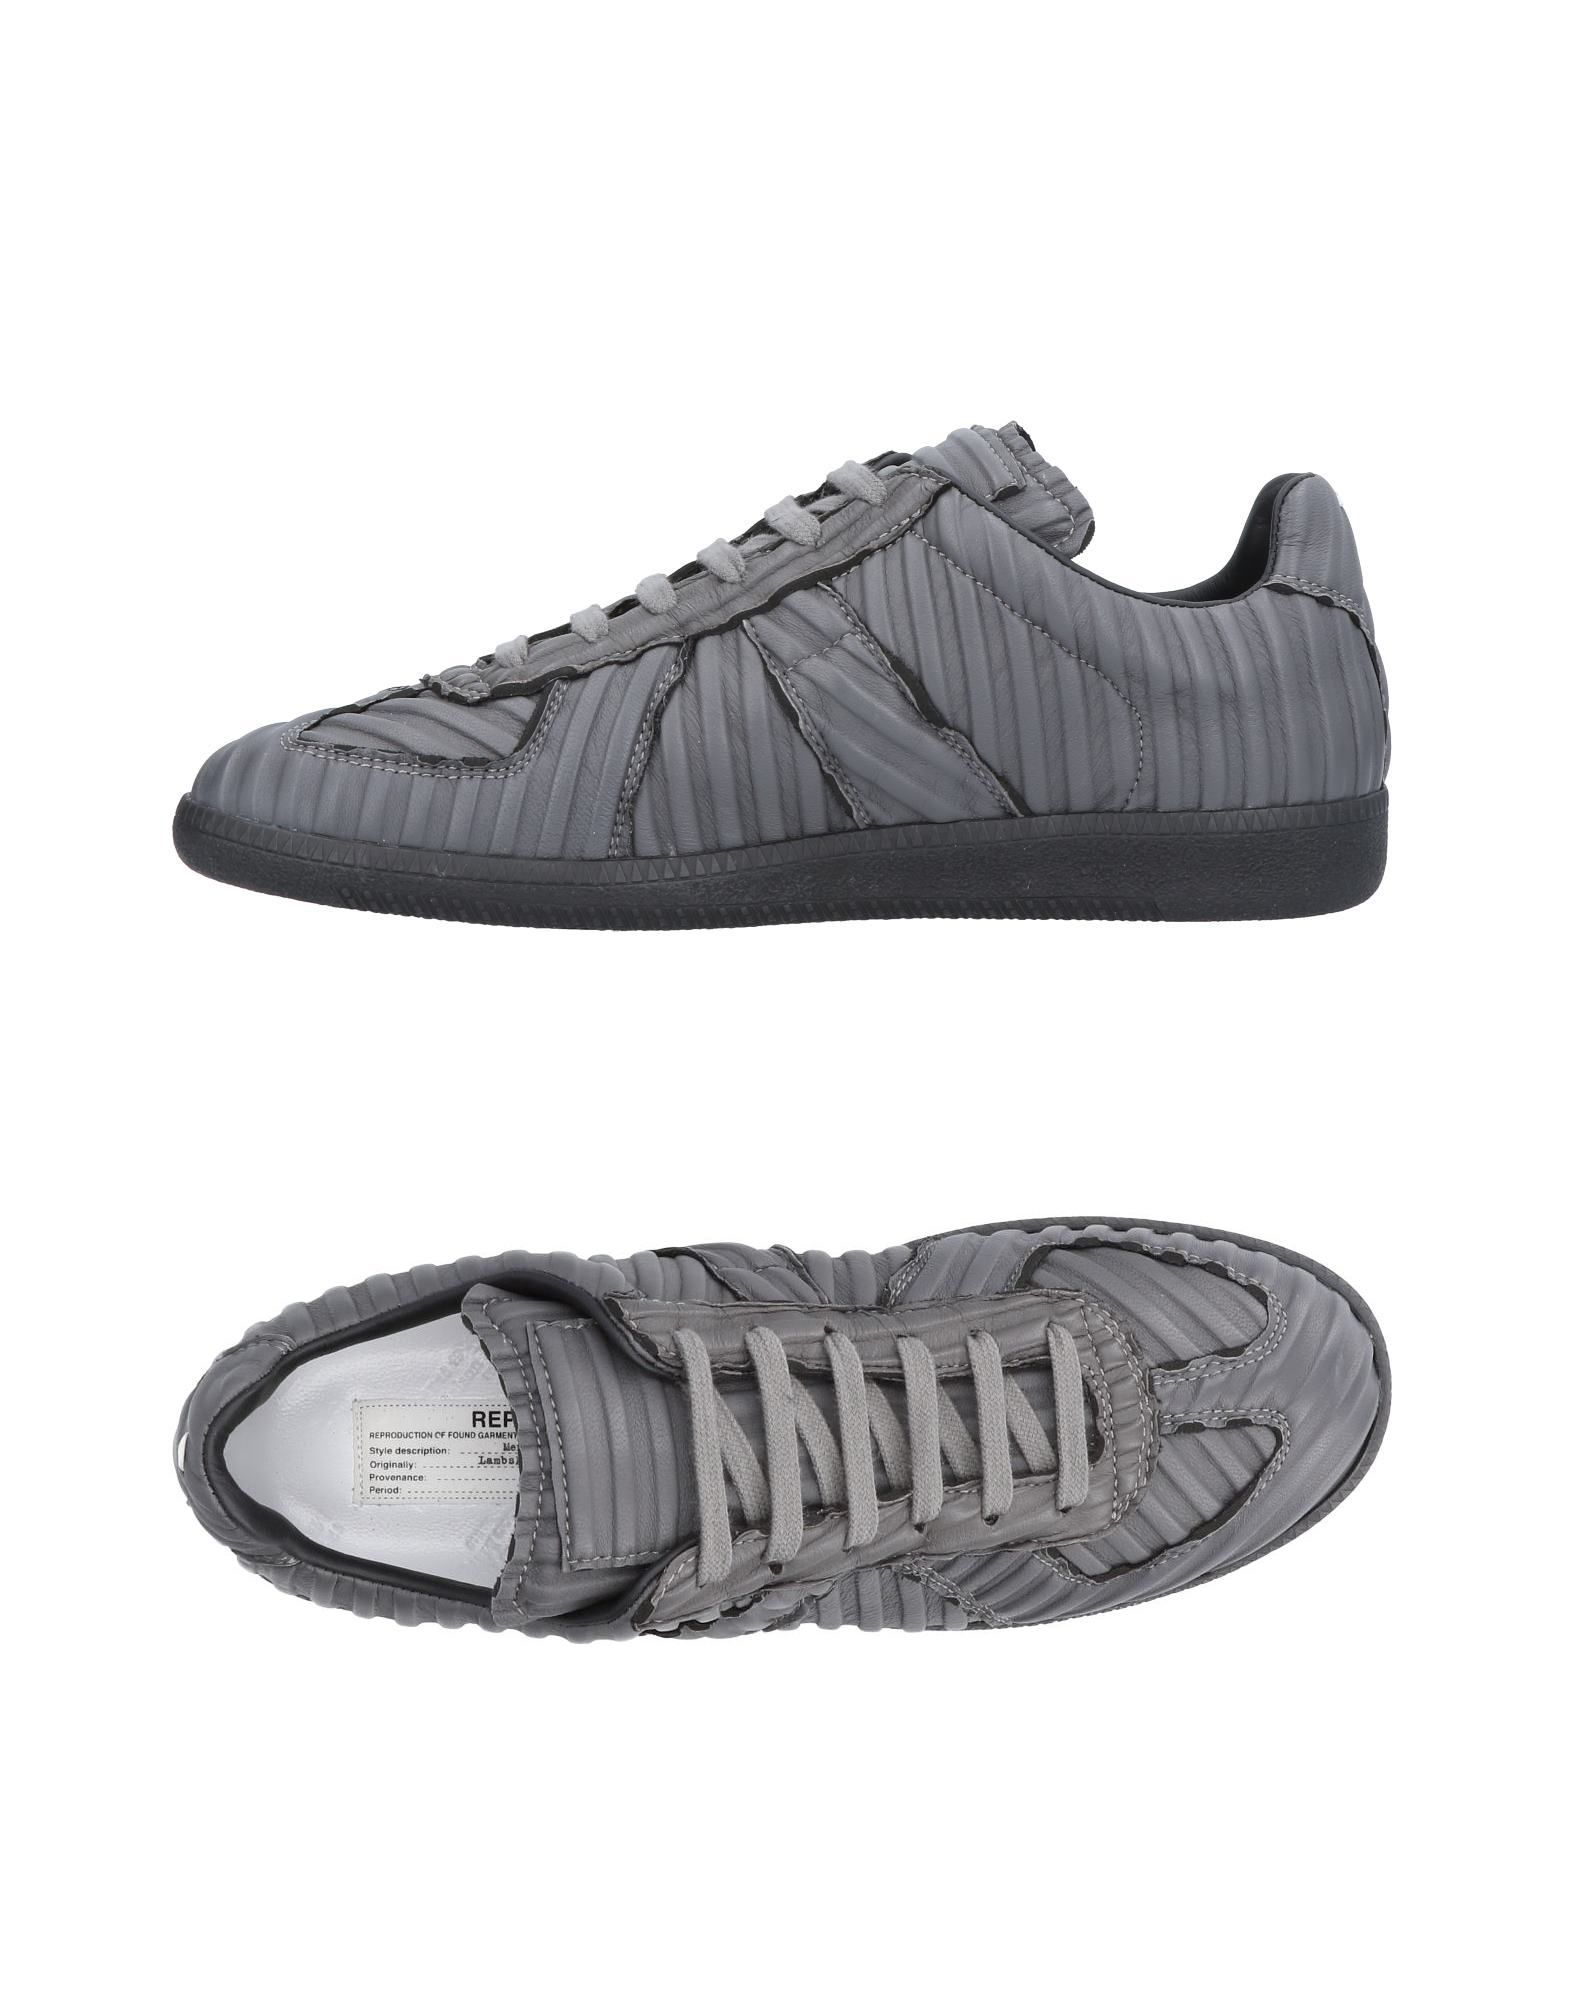 Maison Margiela Sneakers Herren  11462543HW Gute Qualität beliebte Schuhe